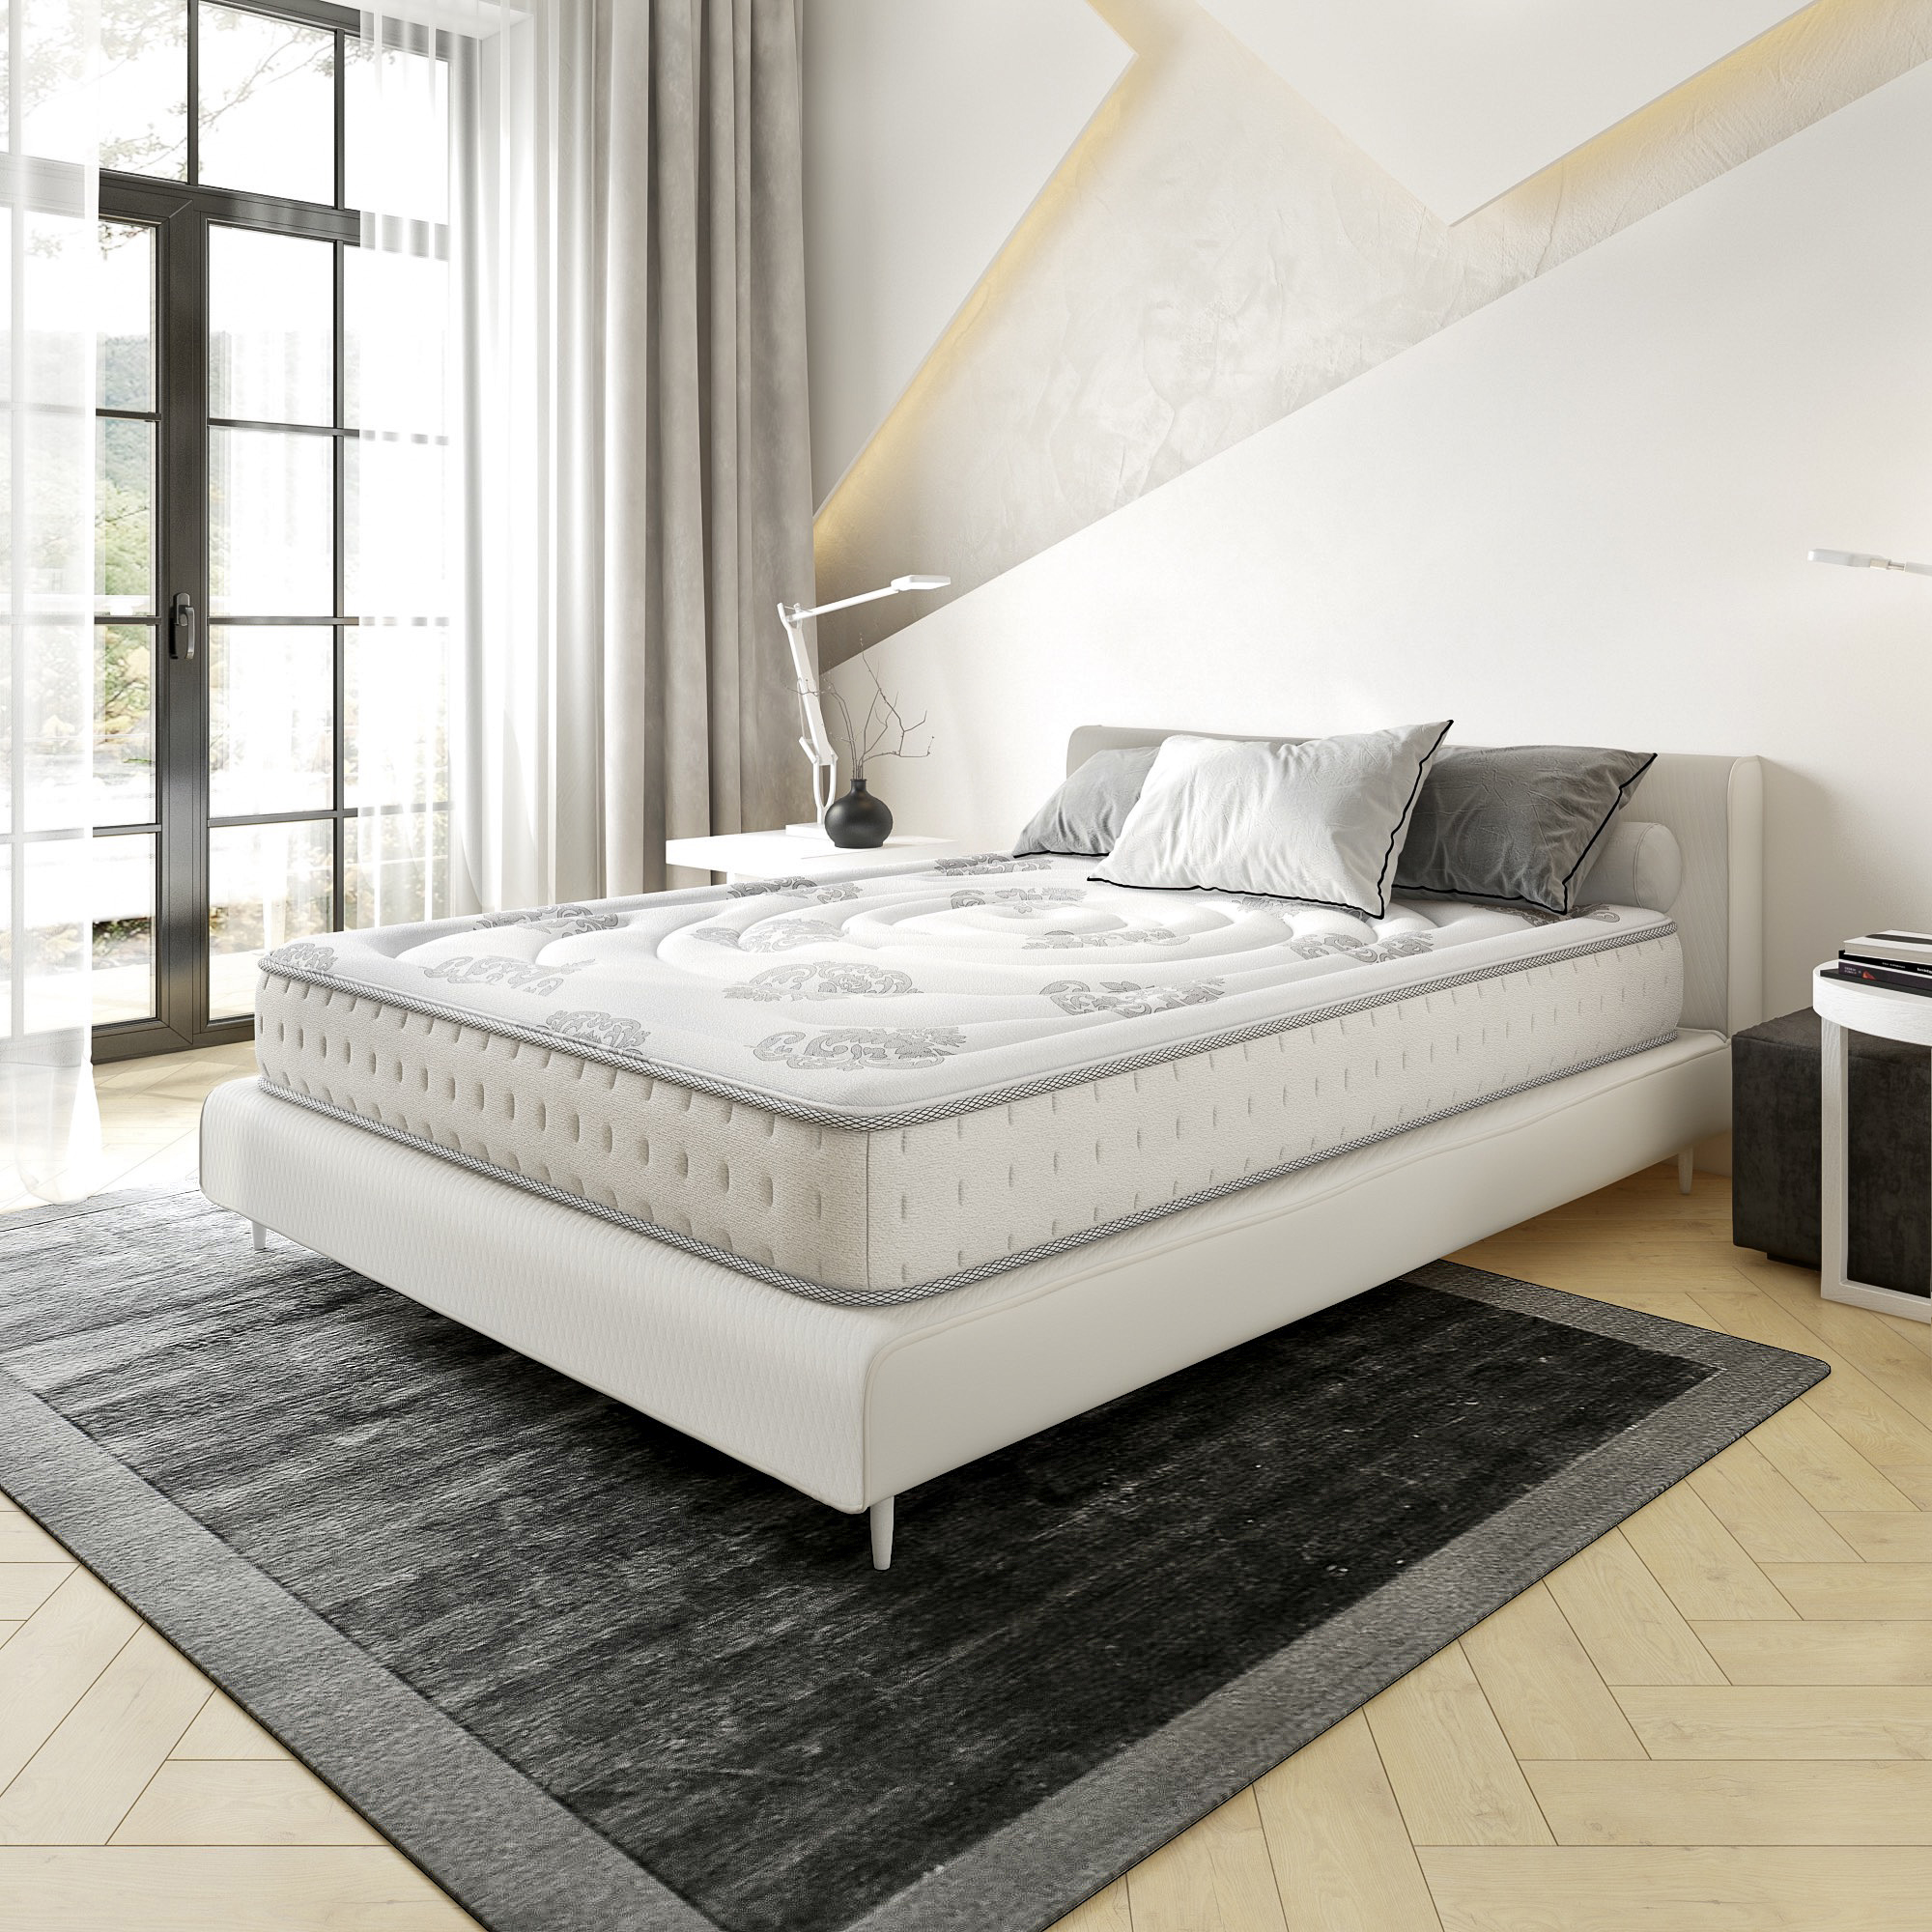 Classic Brands Decker Firm Hybrid Memory Foam and Innerspring 10.5-Inch Mattress